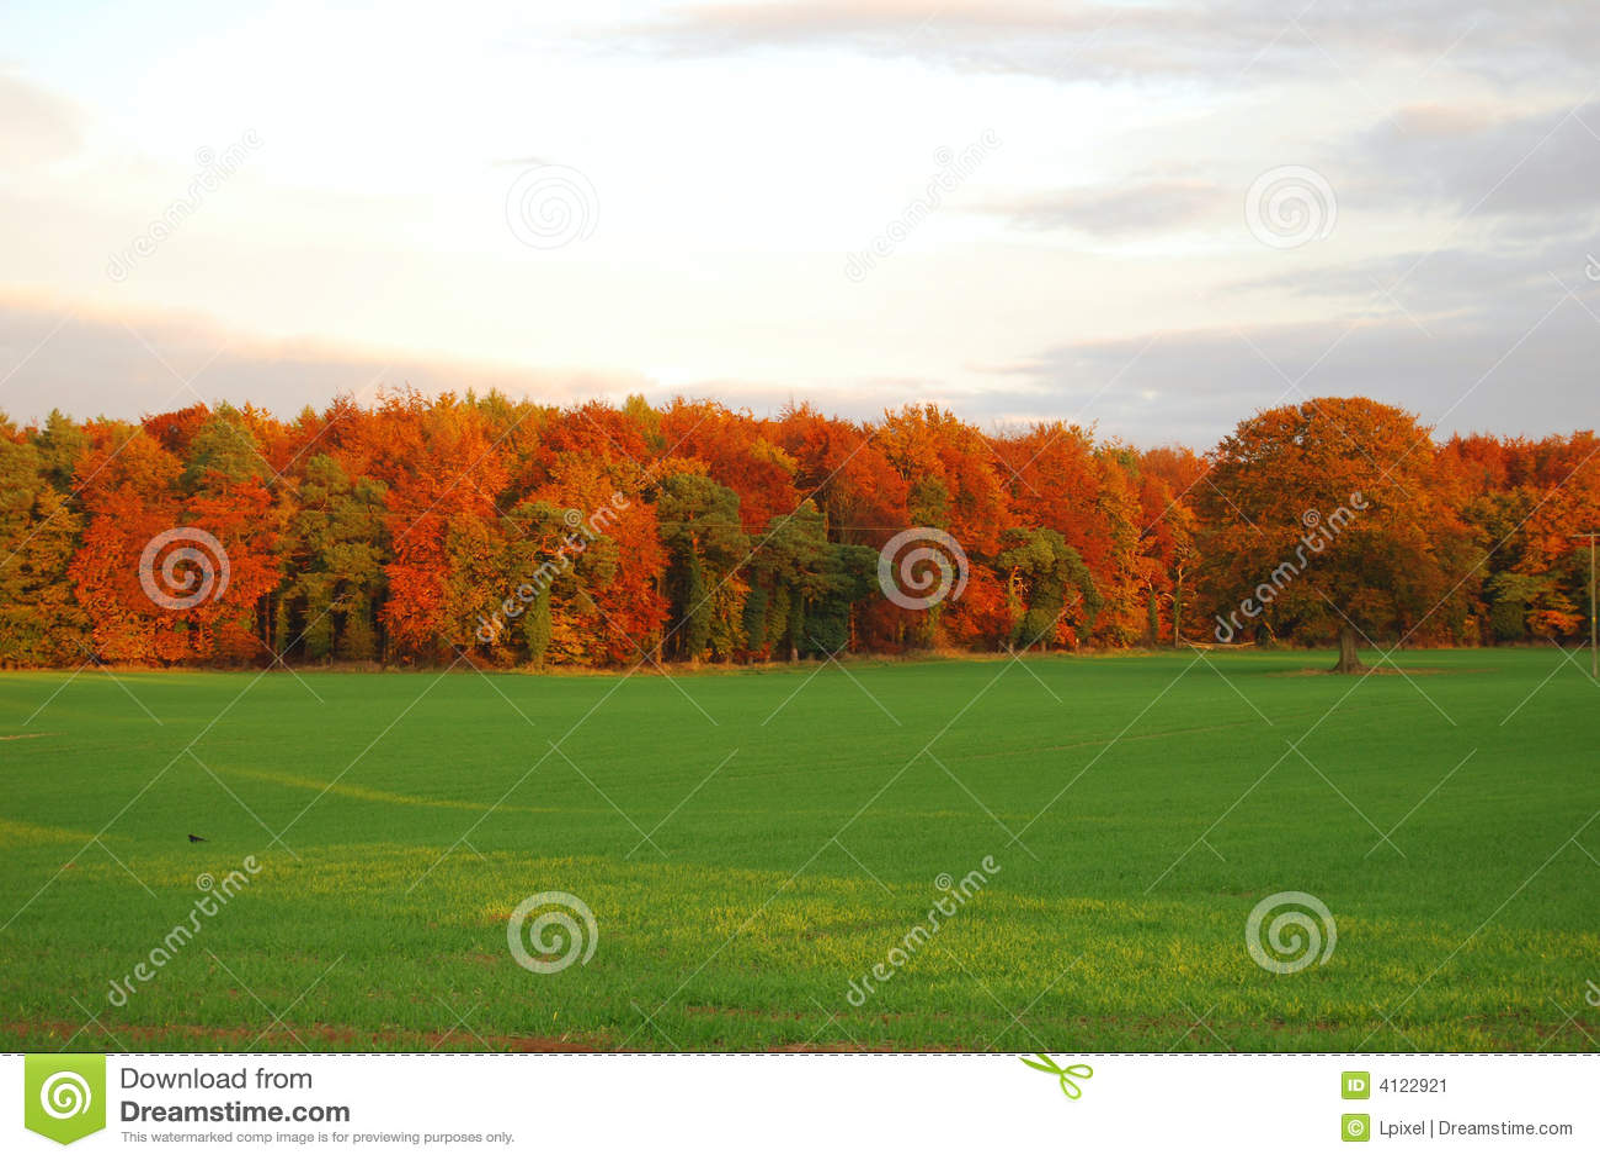 Autumn forest edge